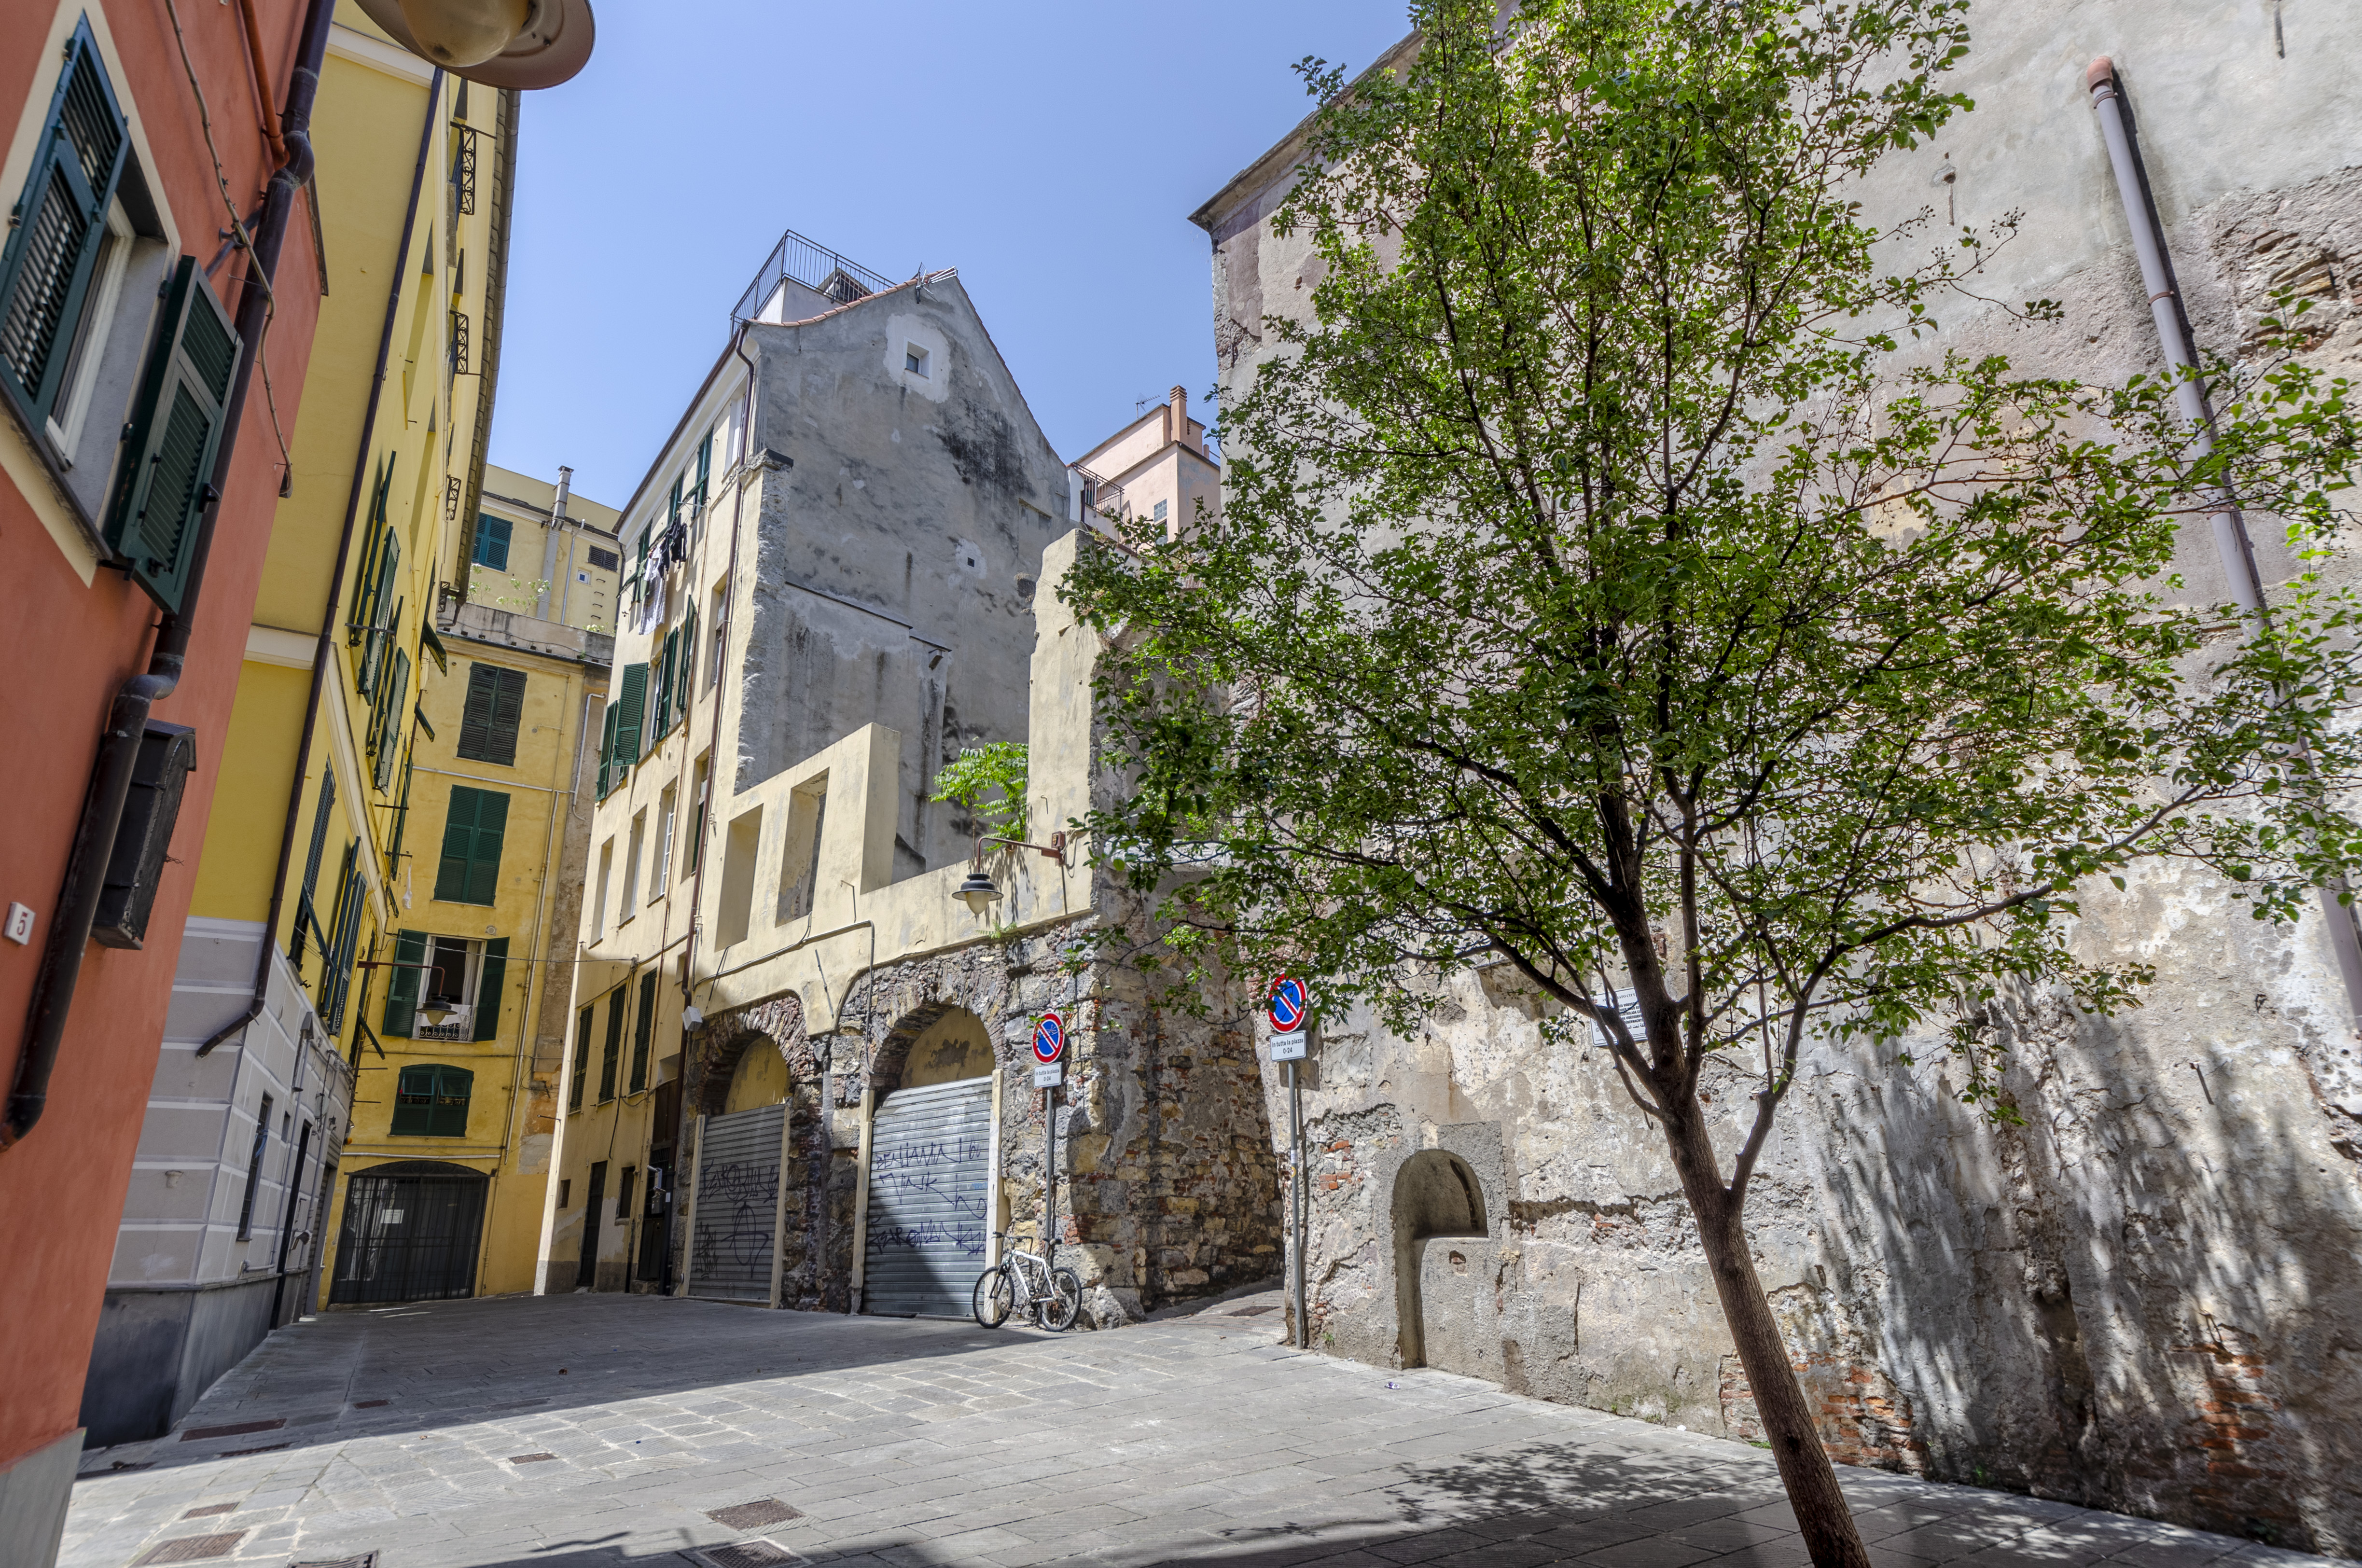 Apartment Hintown Piazza del Roso Genova Universitaria photo 18513799